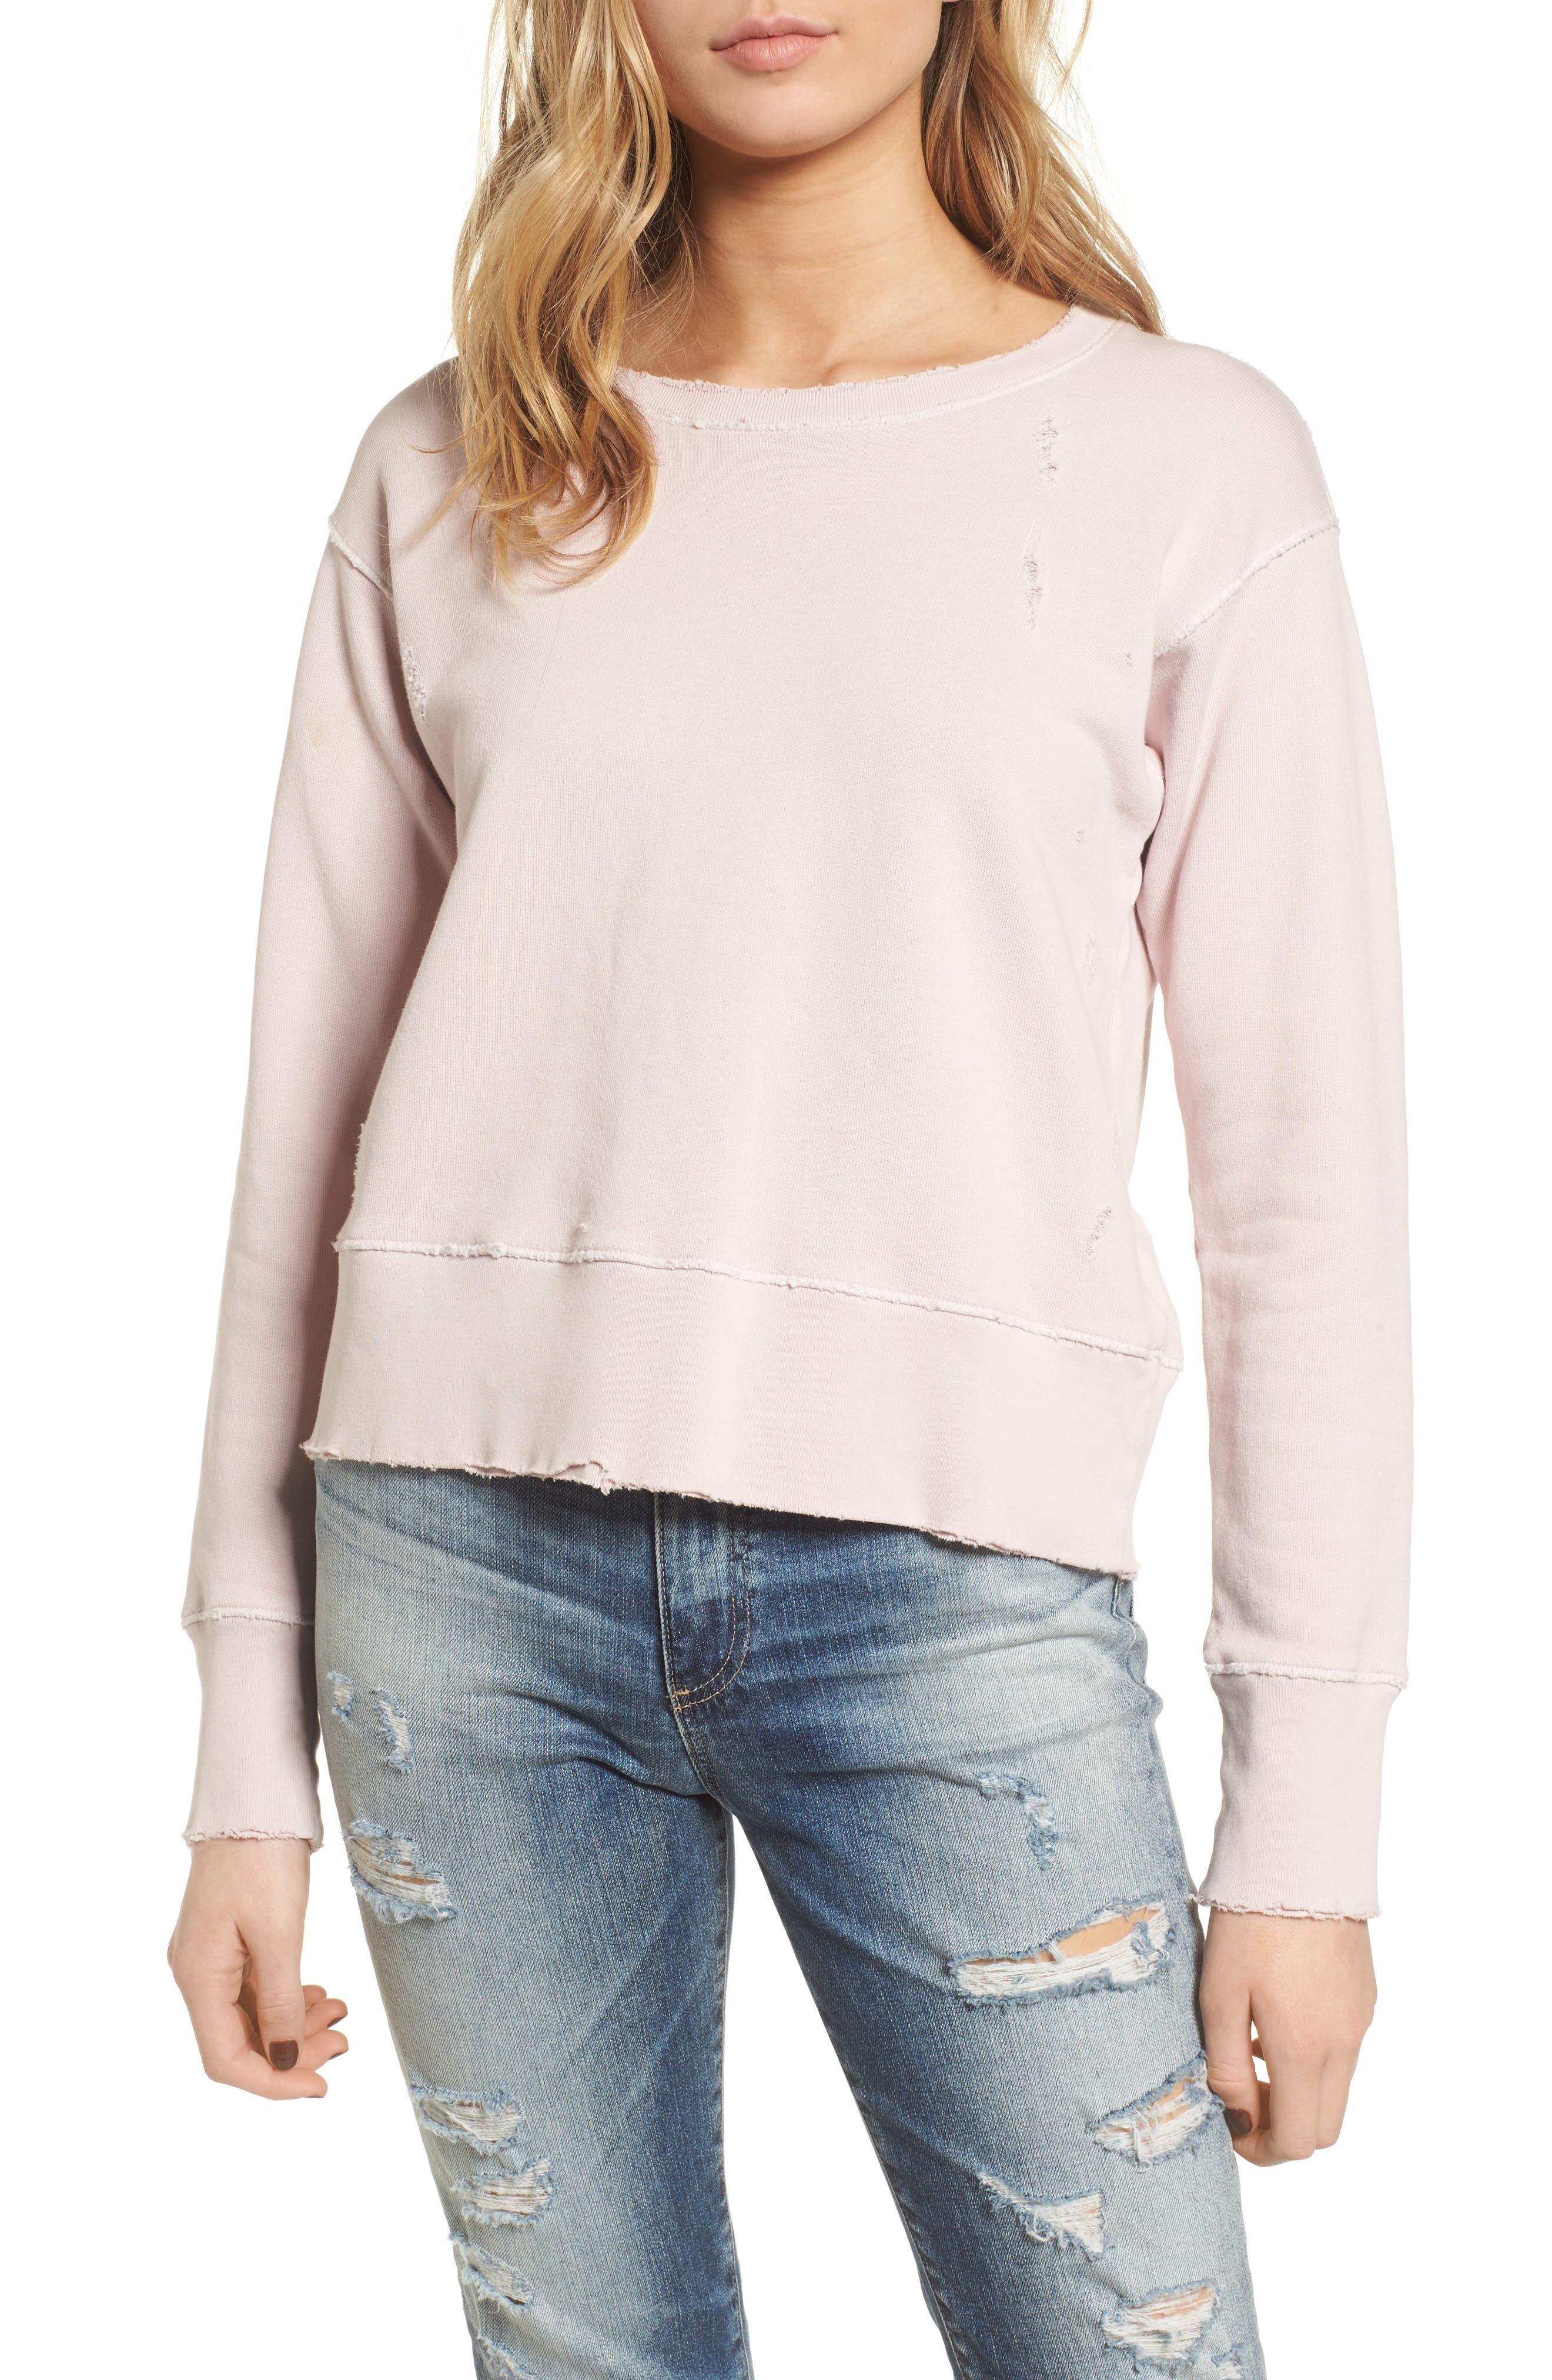 Tee Lab Cotton Sweatshirt,                         Main,                         color,